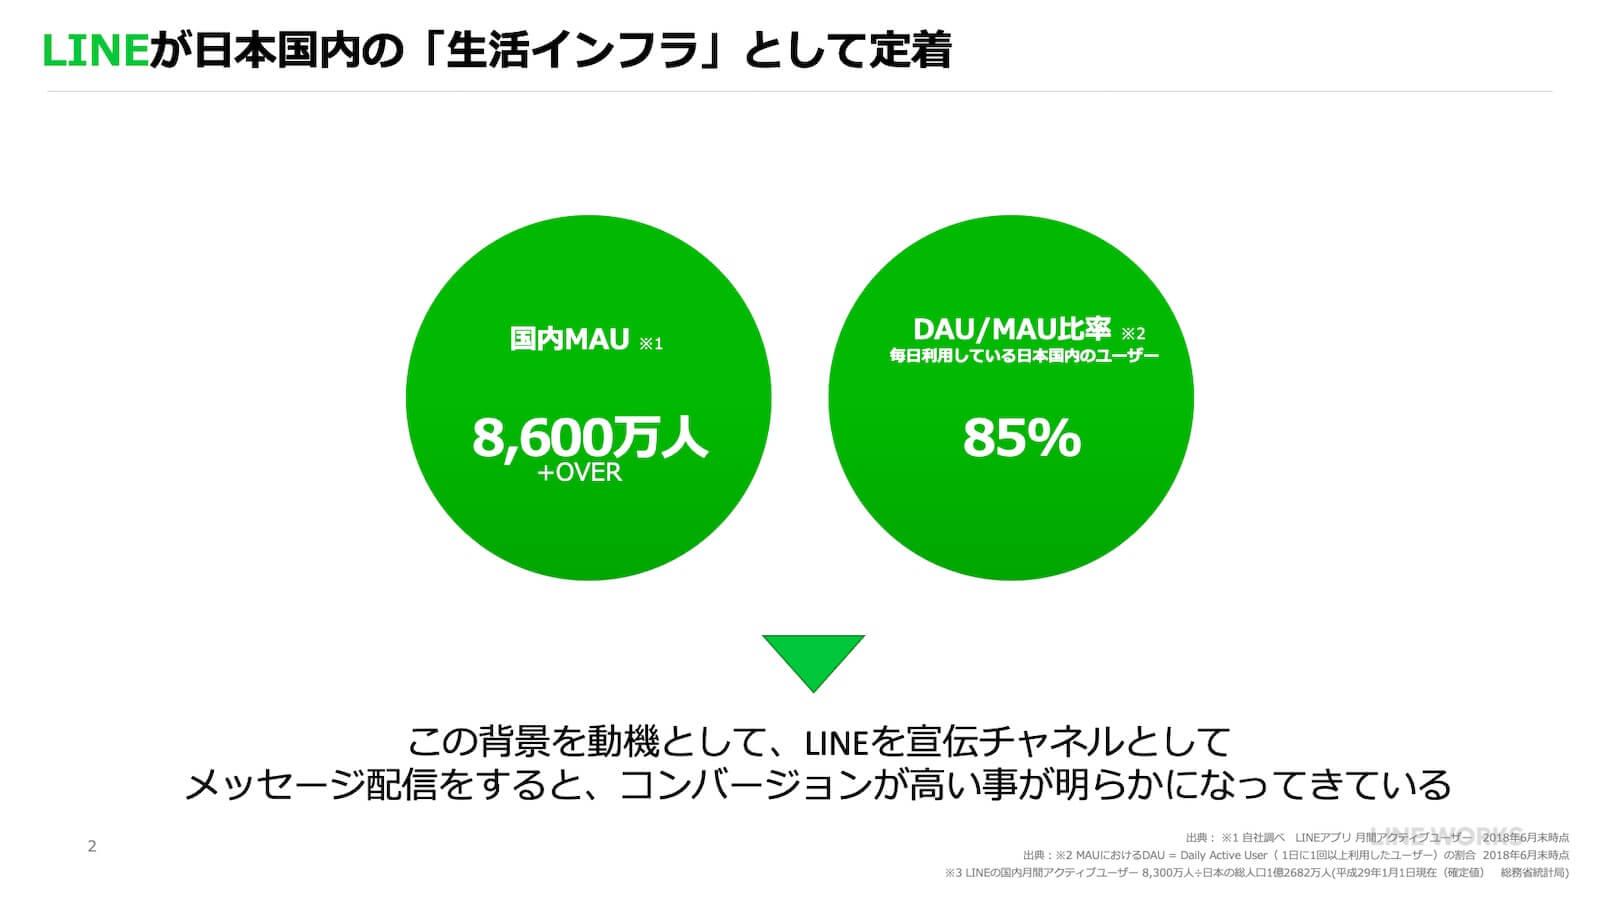 LINEが日本国内の「生活インフラ」として定着